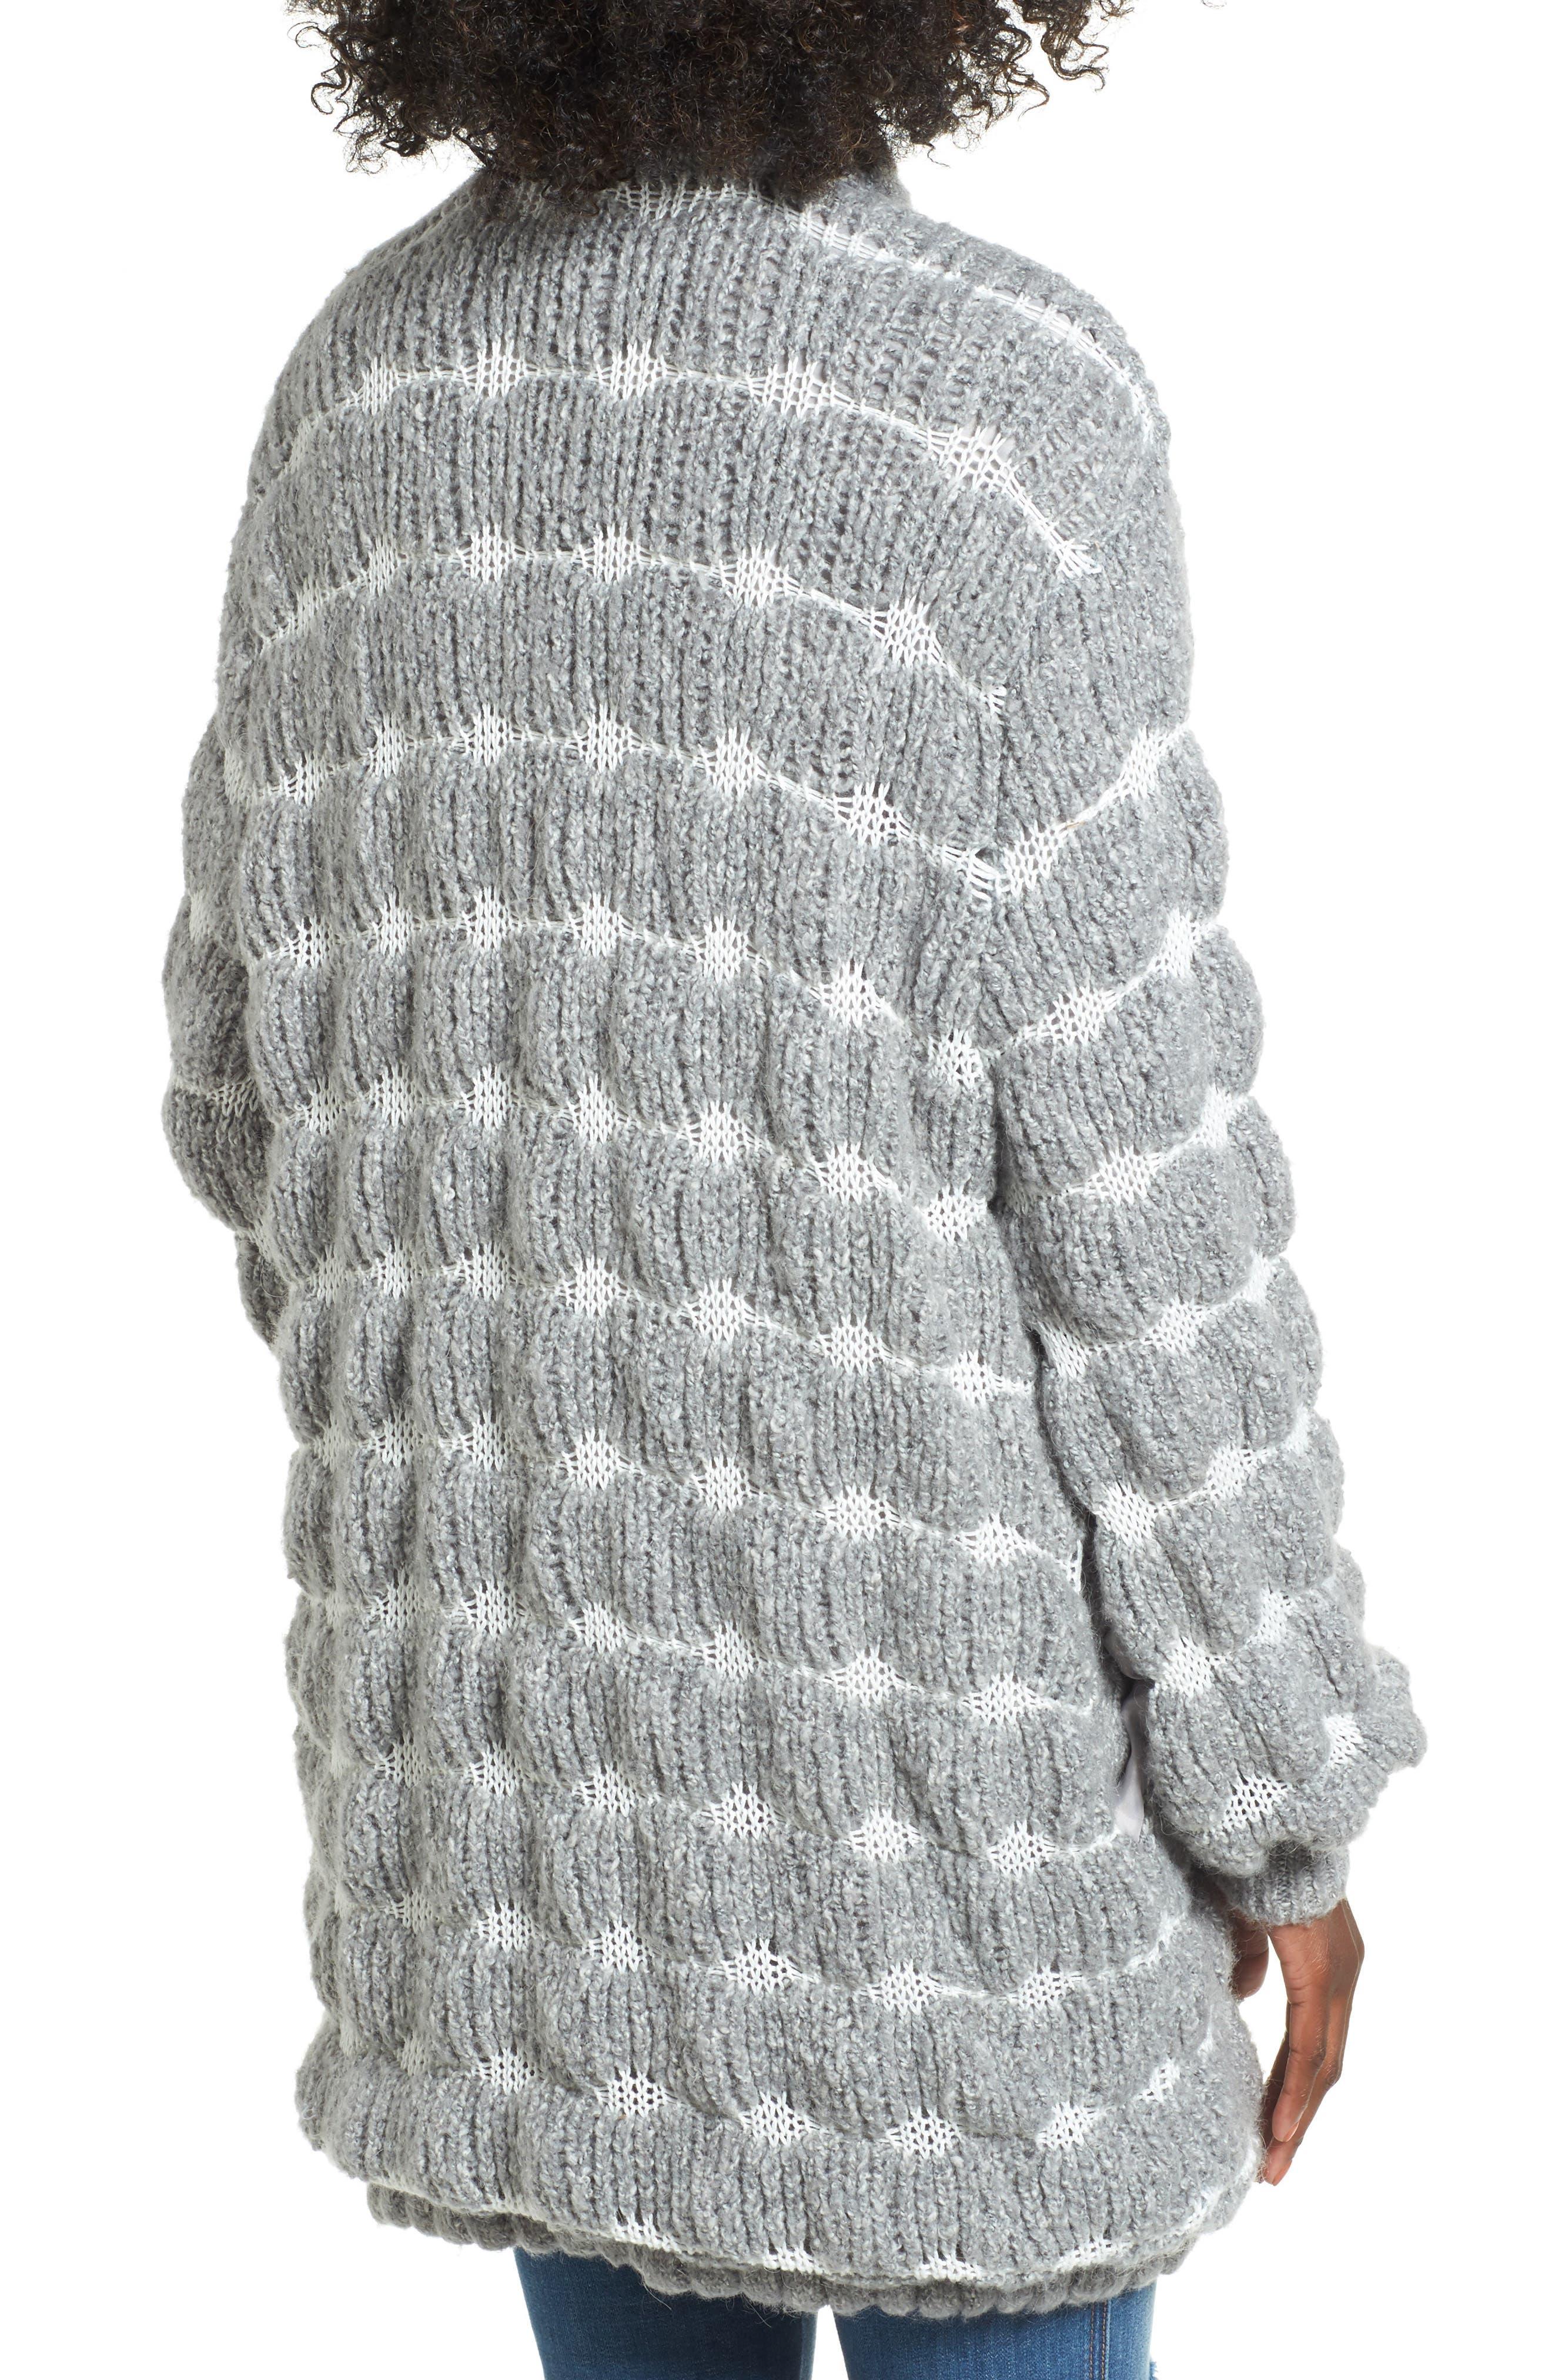 Carmine Sweater,                             Alternate thumbnail 2, color,                             020